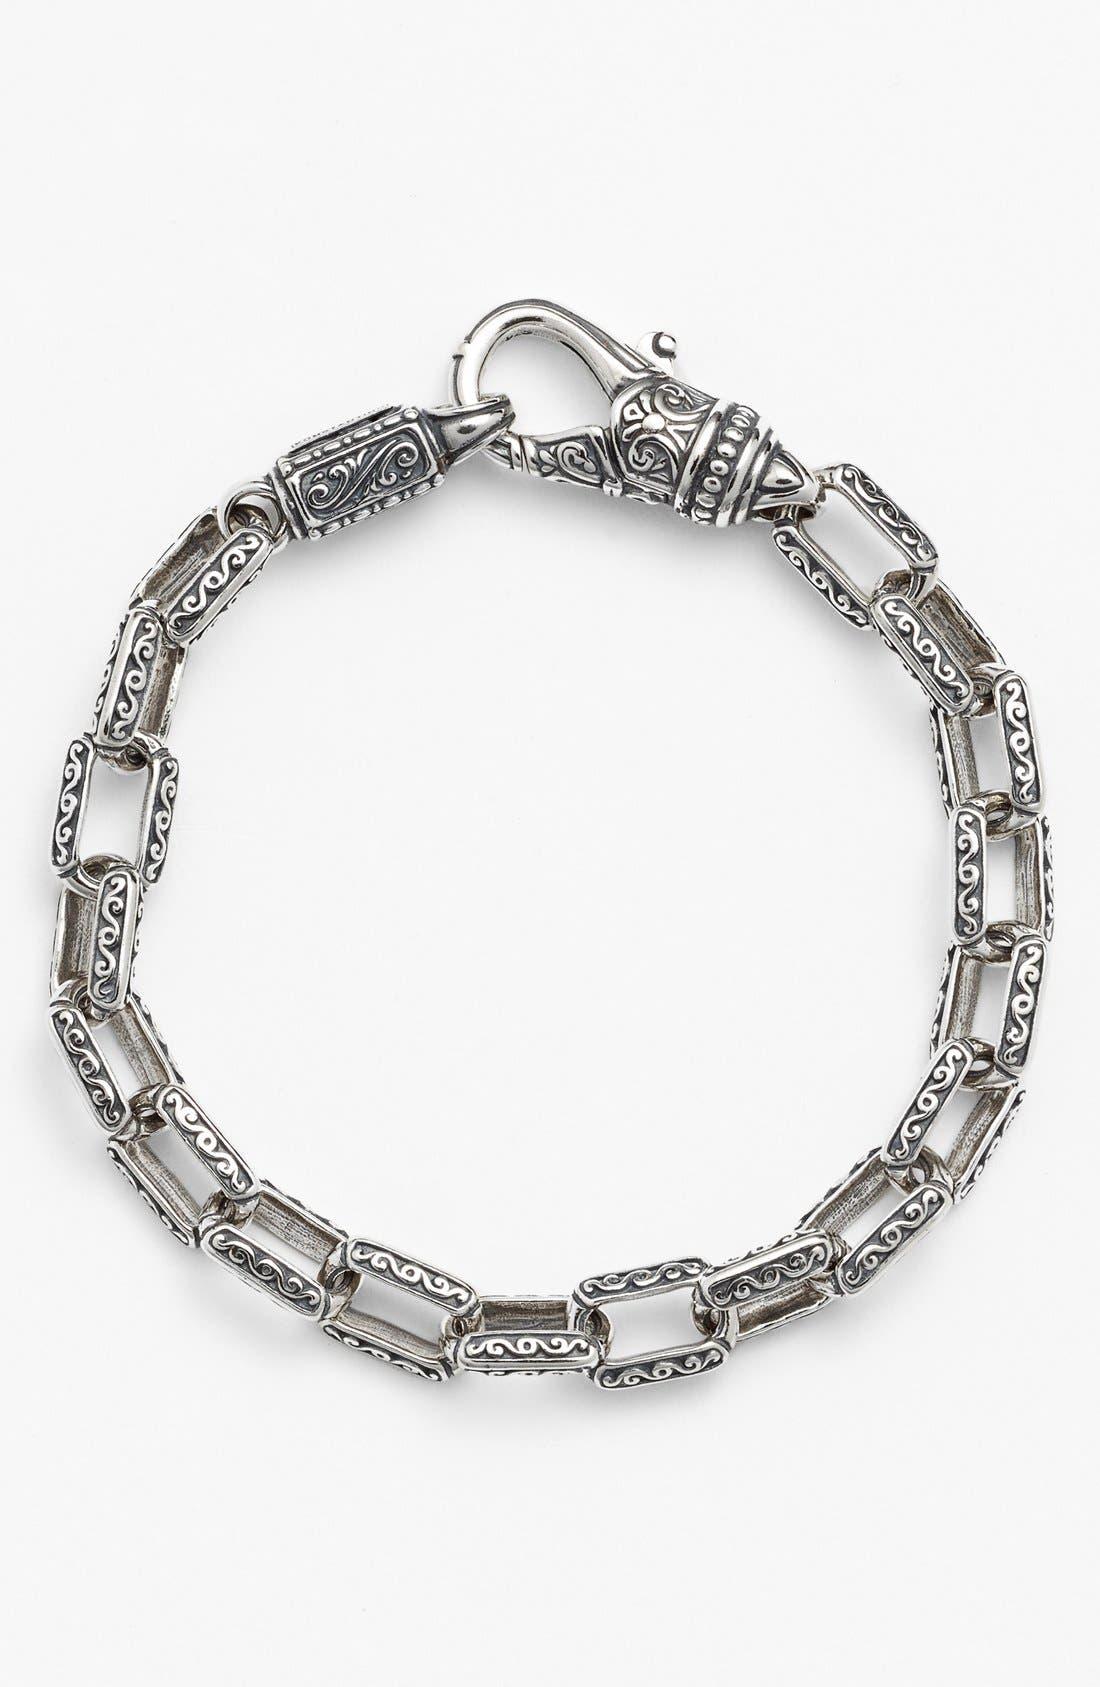 Konstantino 'Classics' Etched Link Bracelet